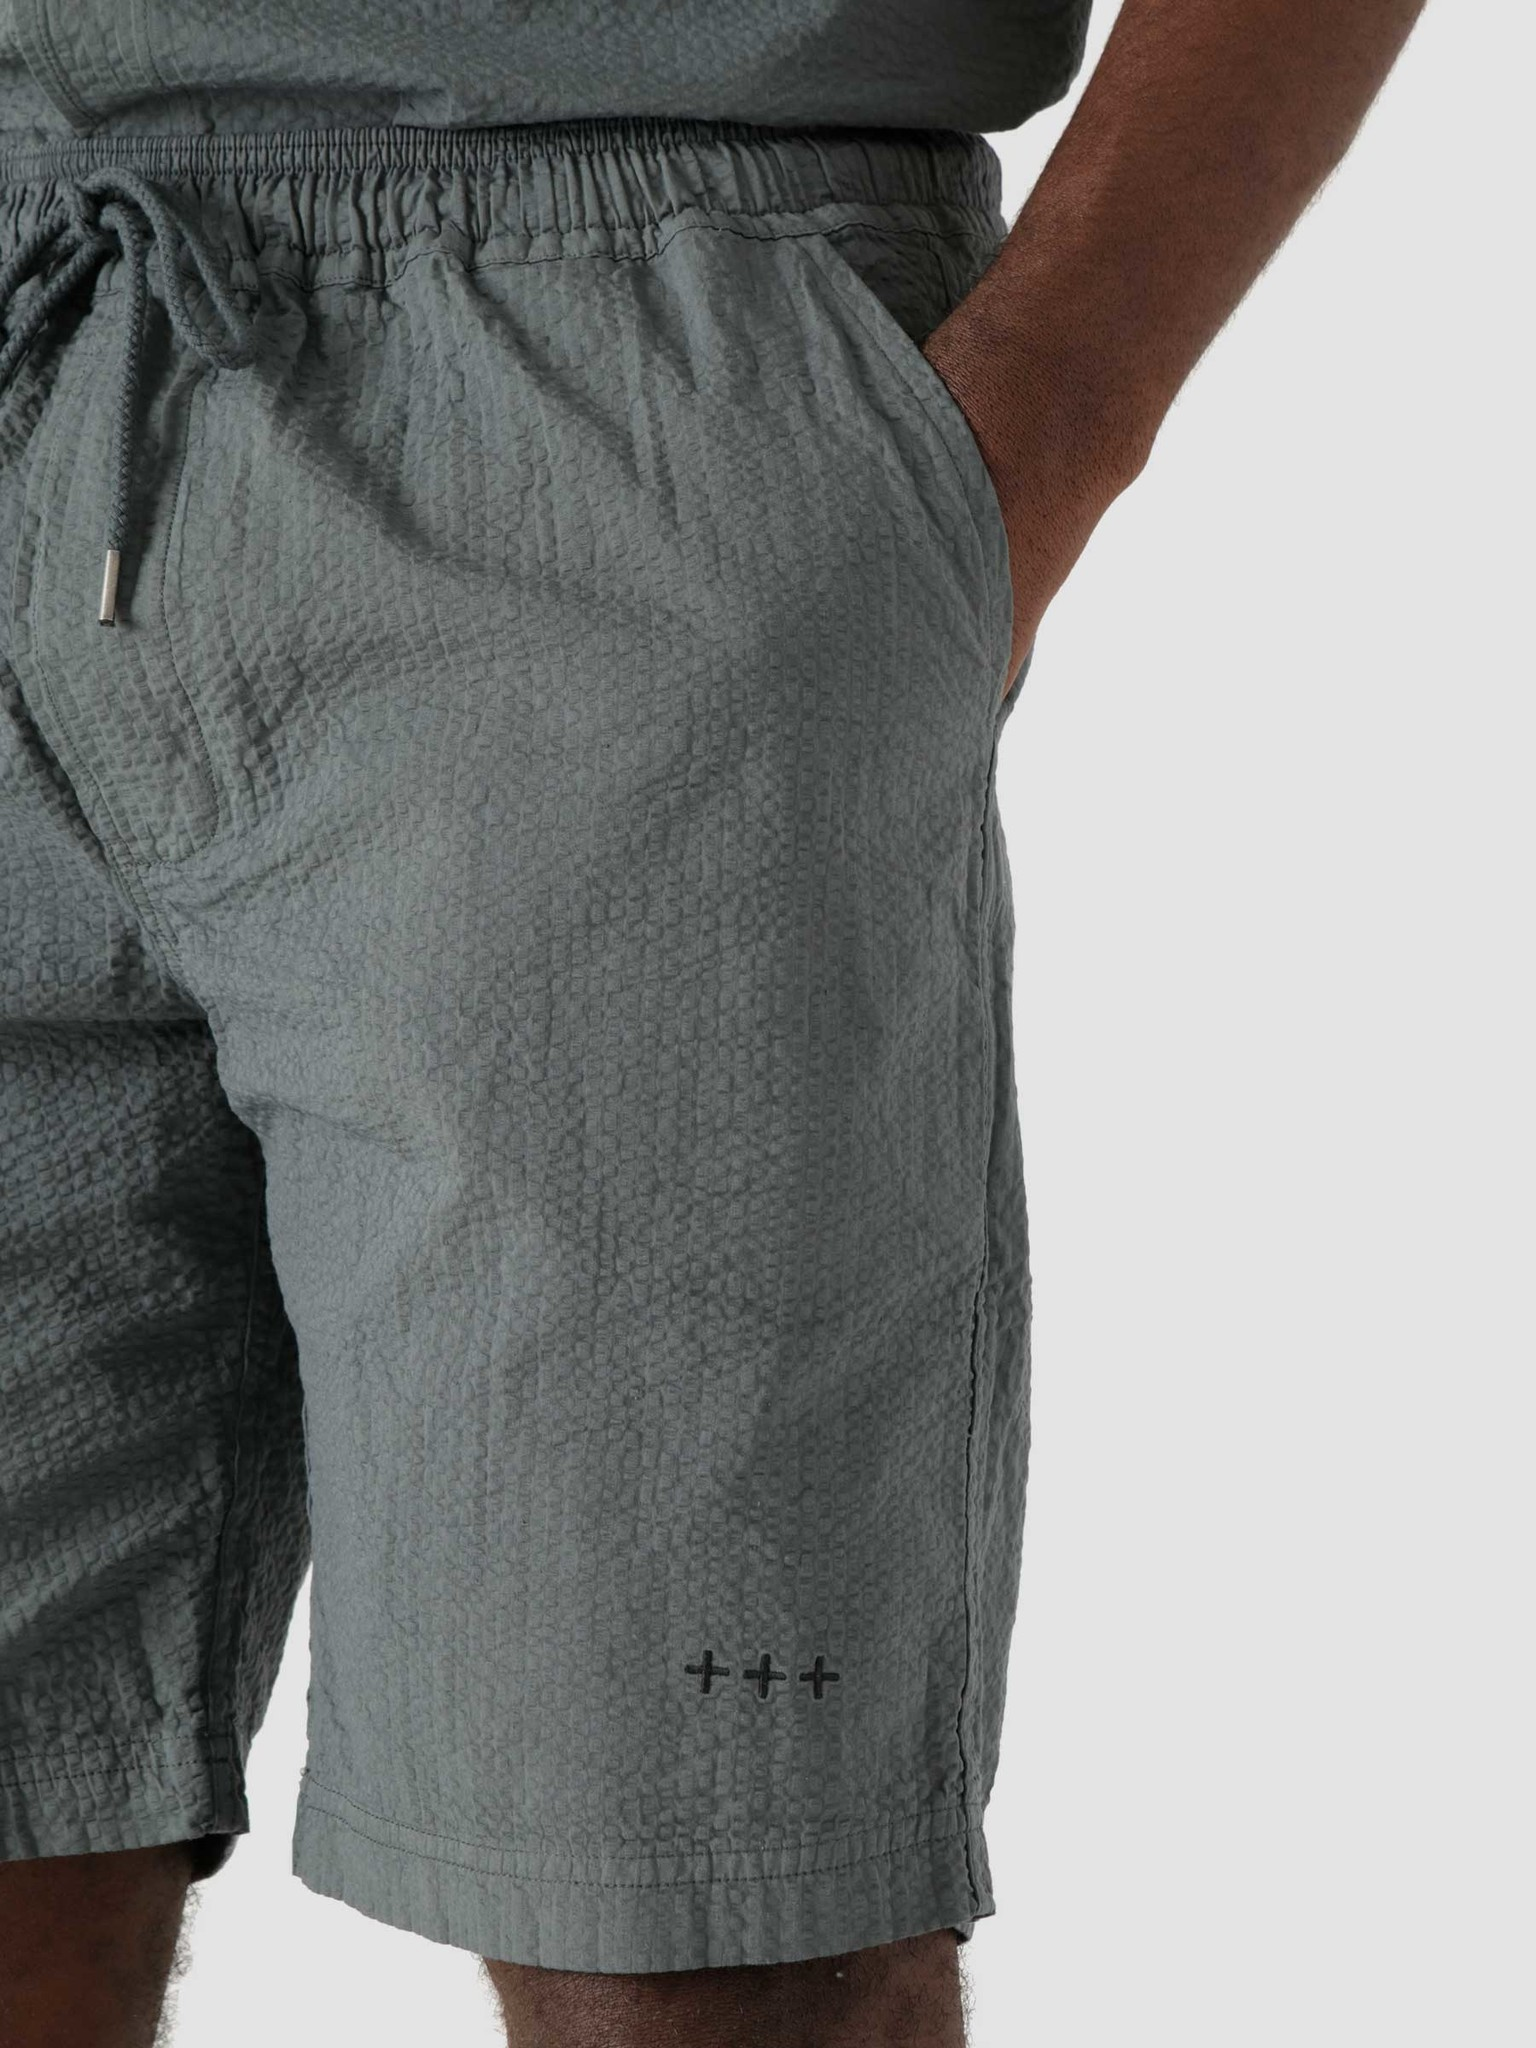 Quality Blanks Quality Blanks QB36 Seersucker Short Teal Blue